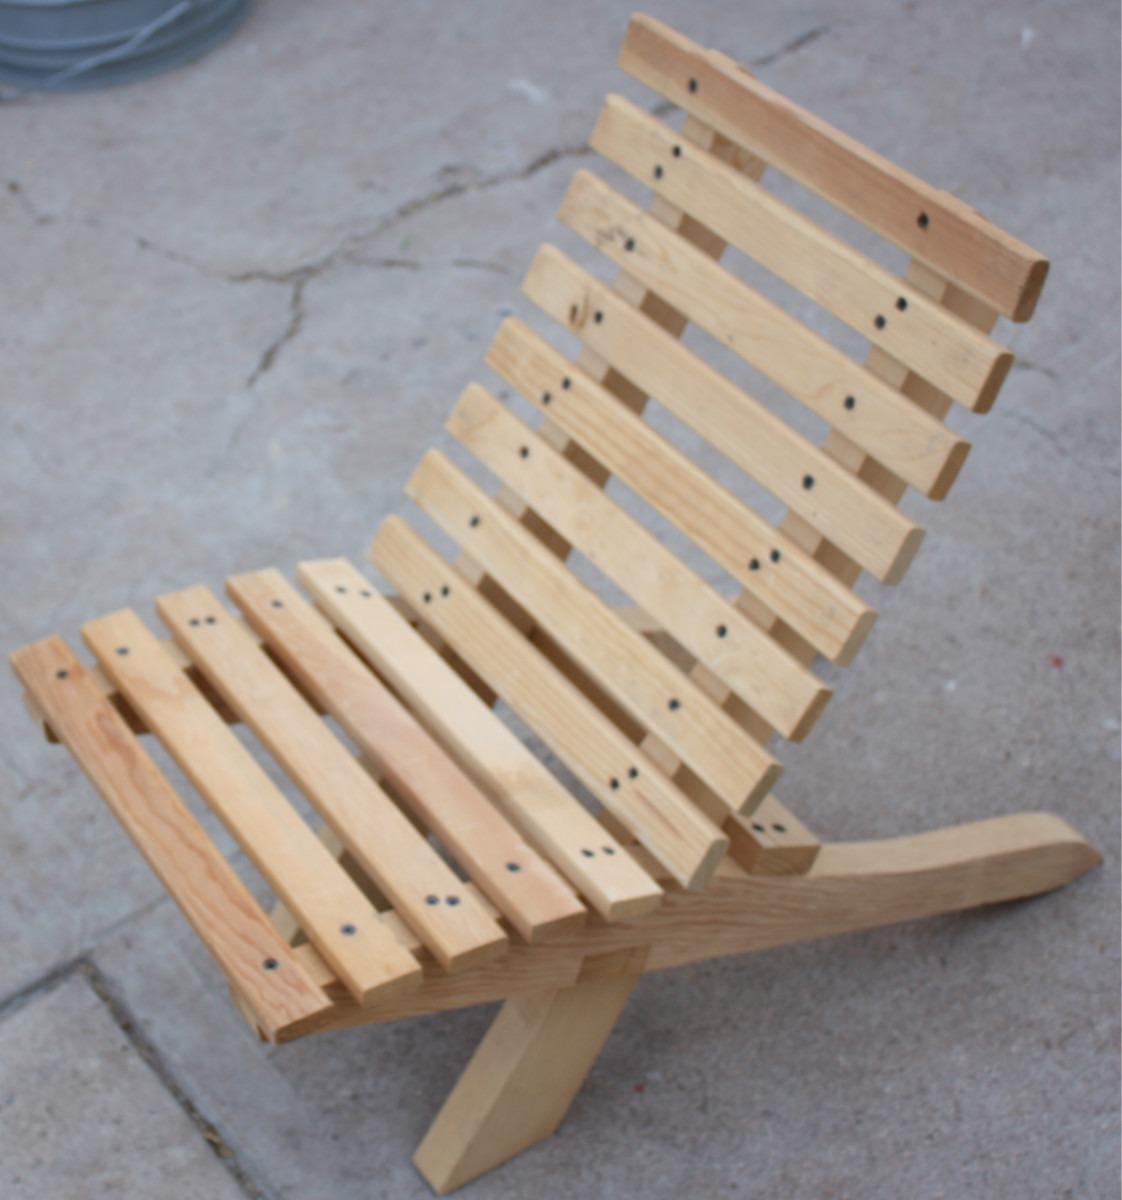 Silla para ni o mueble plegable madera jardin o interiores for Muebles para playa y jardin